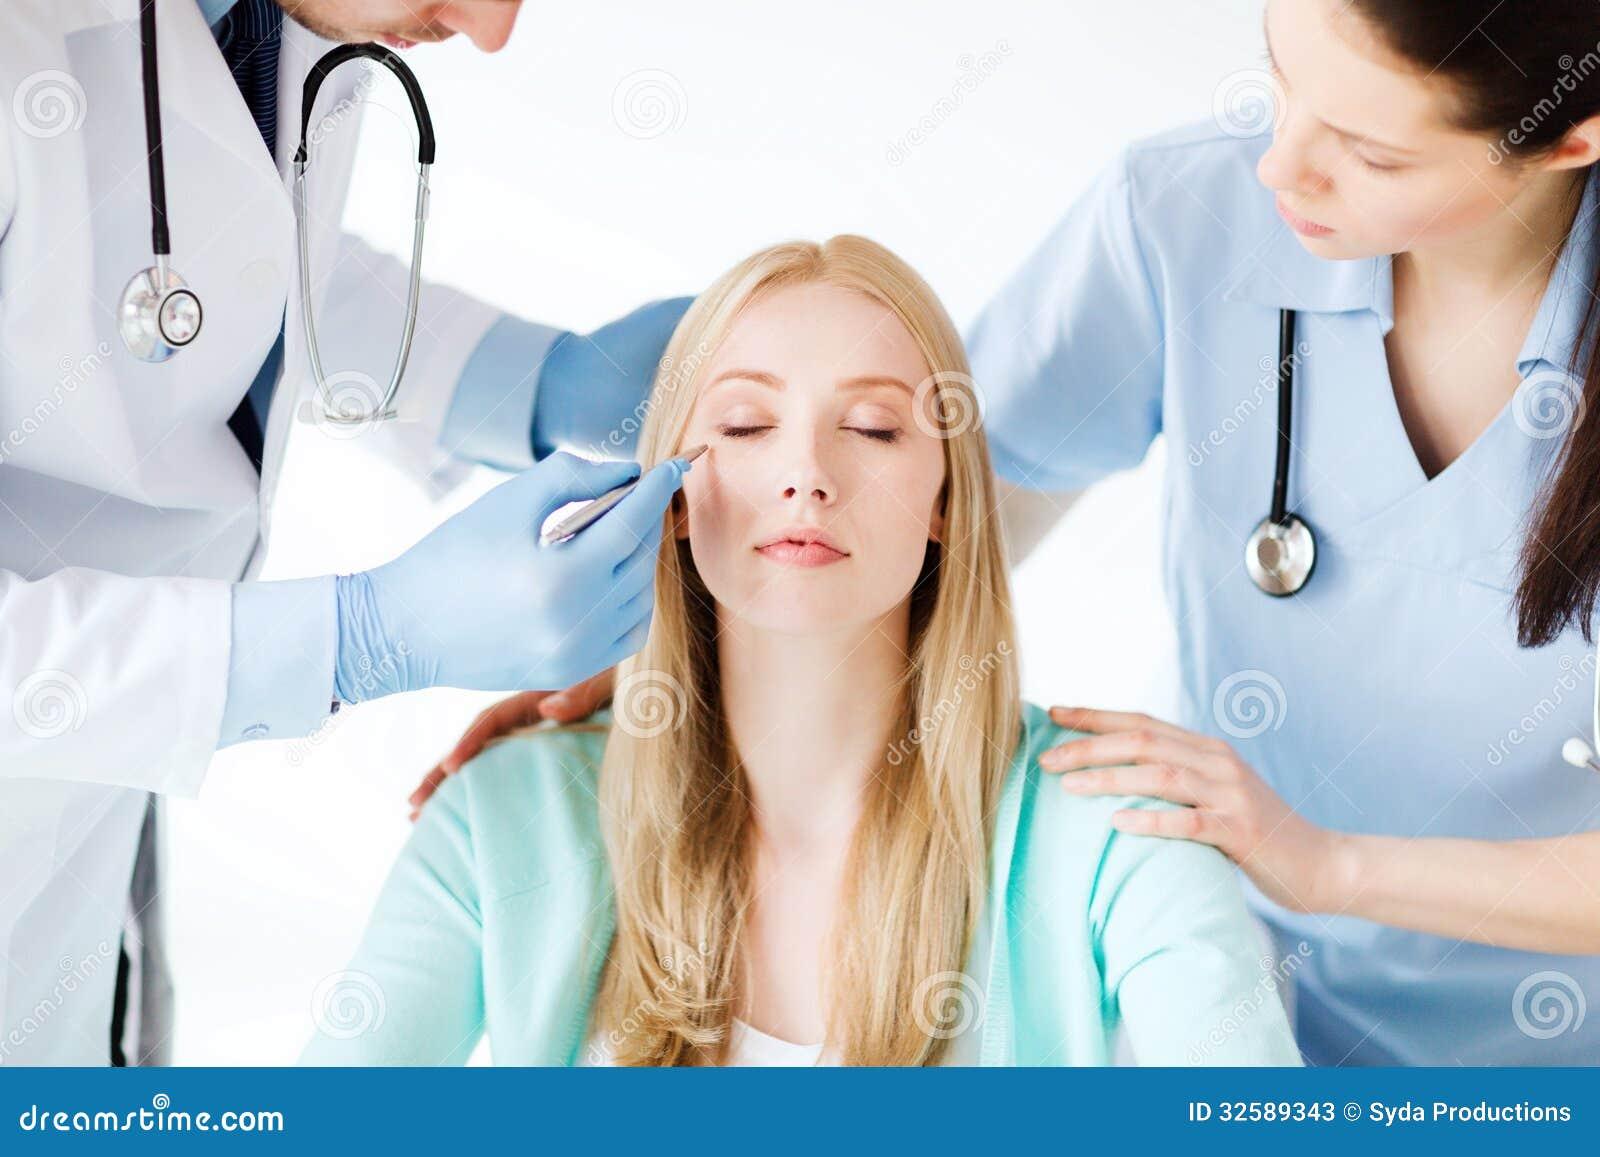 medical surgery nurse